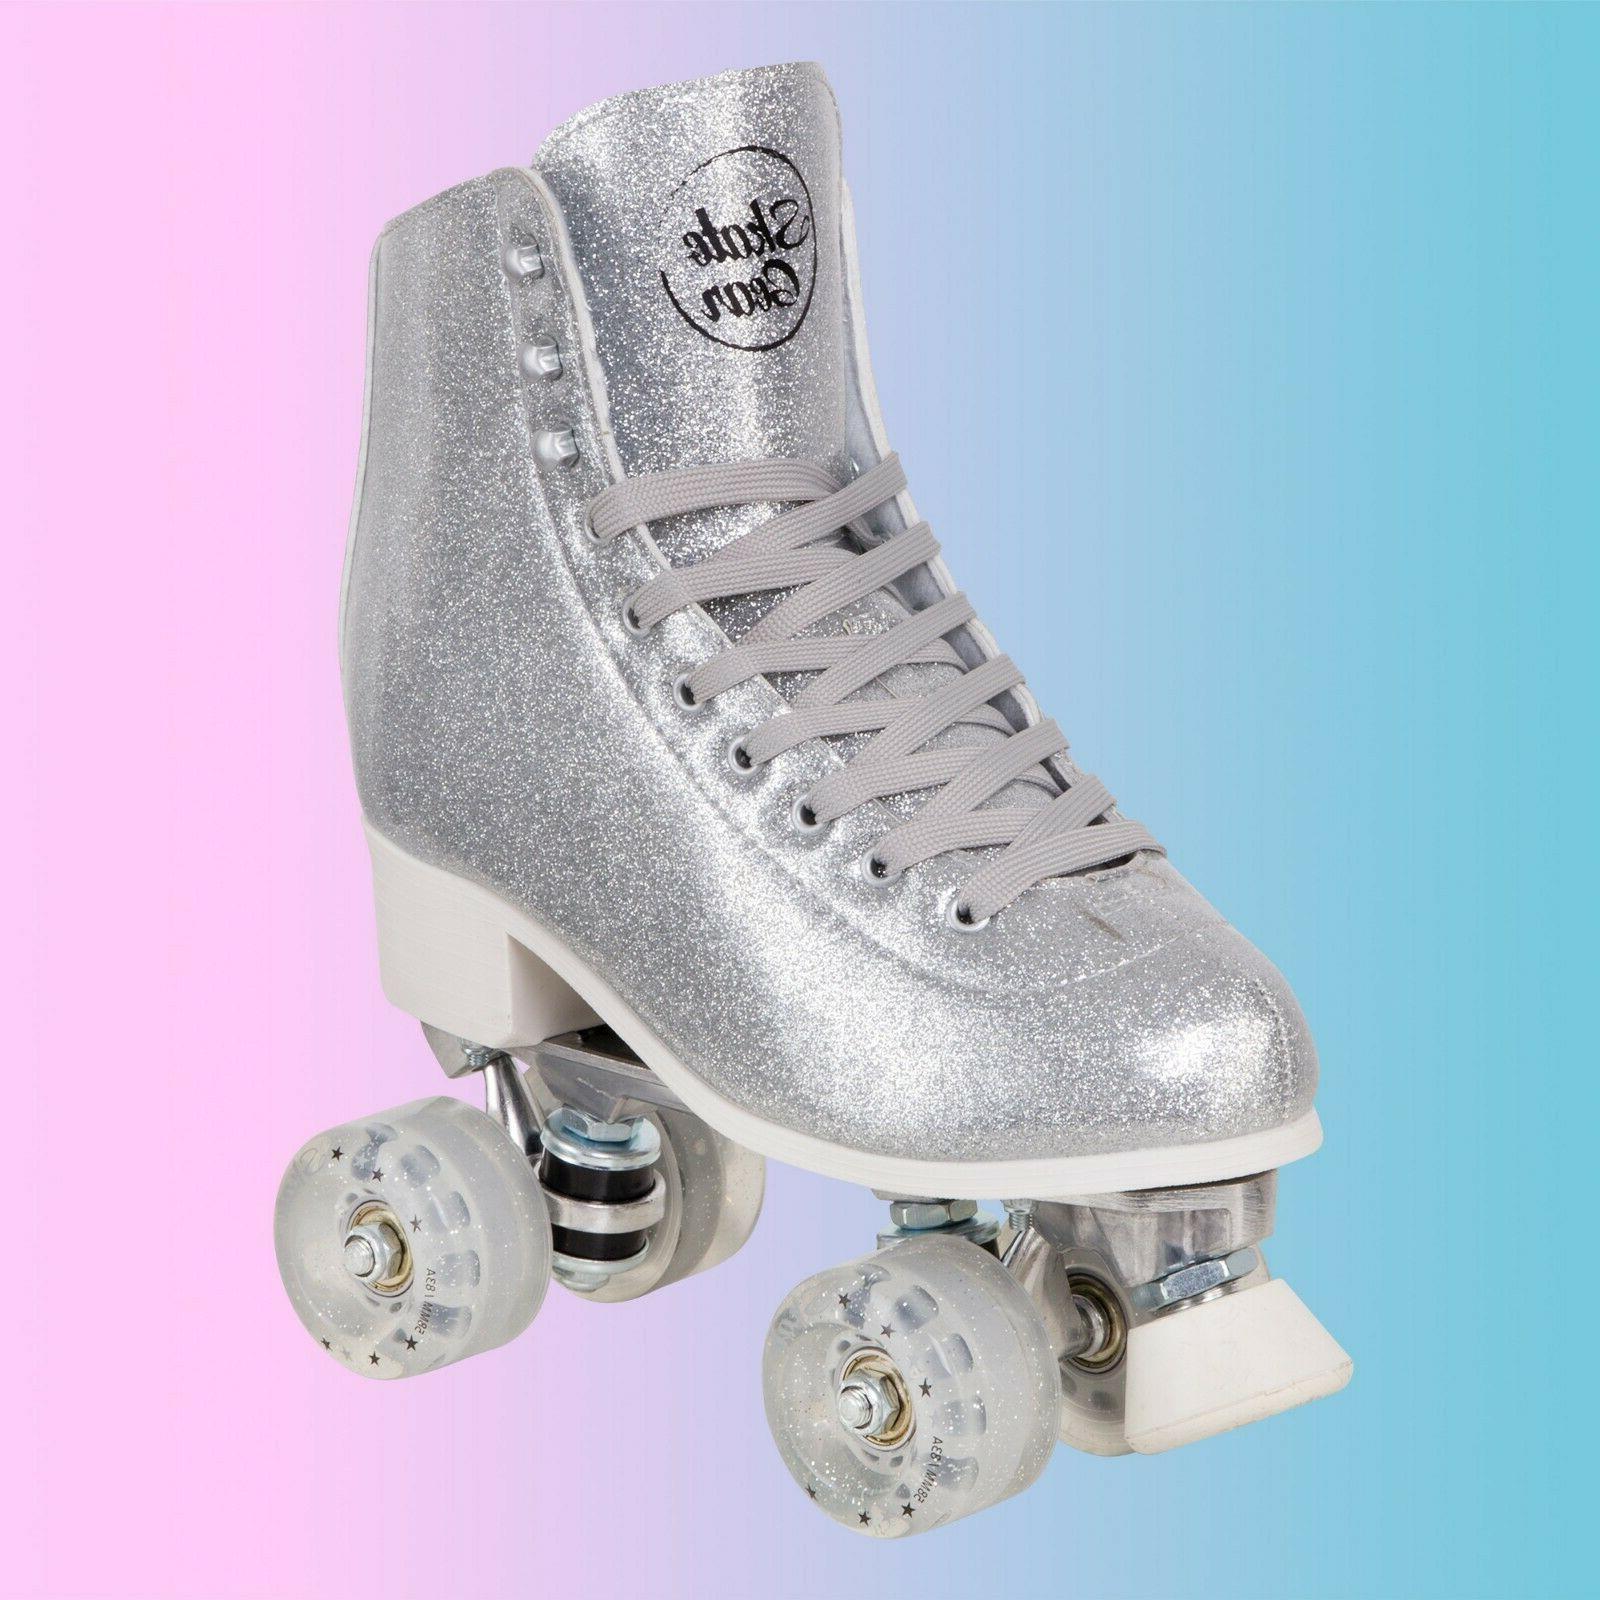 Skate Glittery Roller Adults Summer Ride